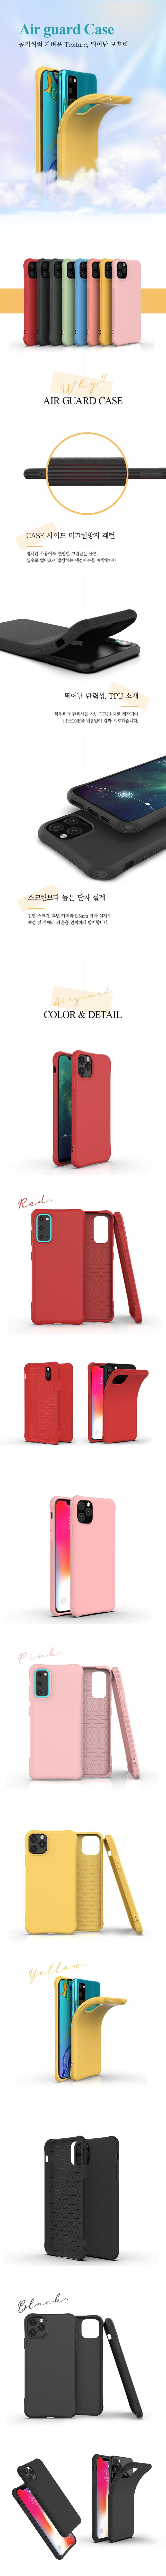 Tongkun Jungu iPhone 11 Pro Max iPhone XS iPhone XR iPhone 8 Air Guard Case